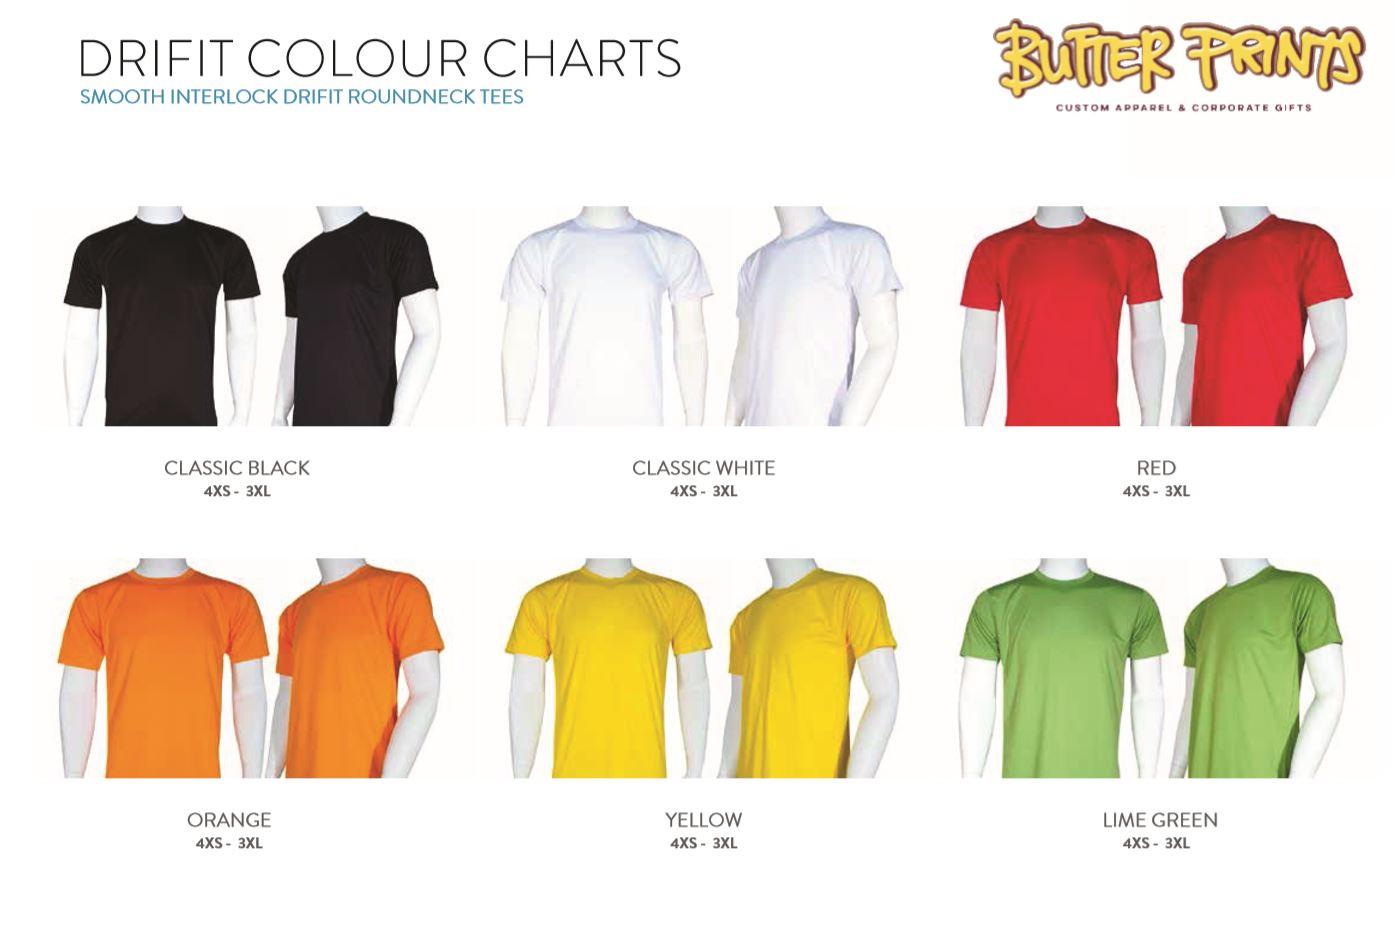 Smooth Drifit Roundneck T-shirts 1.JPG